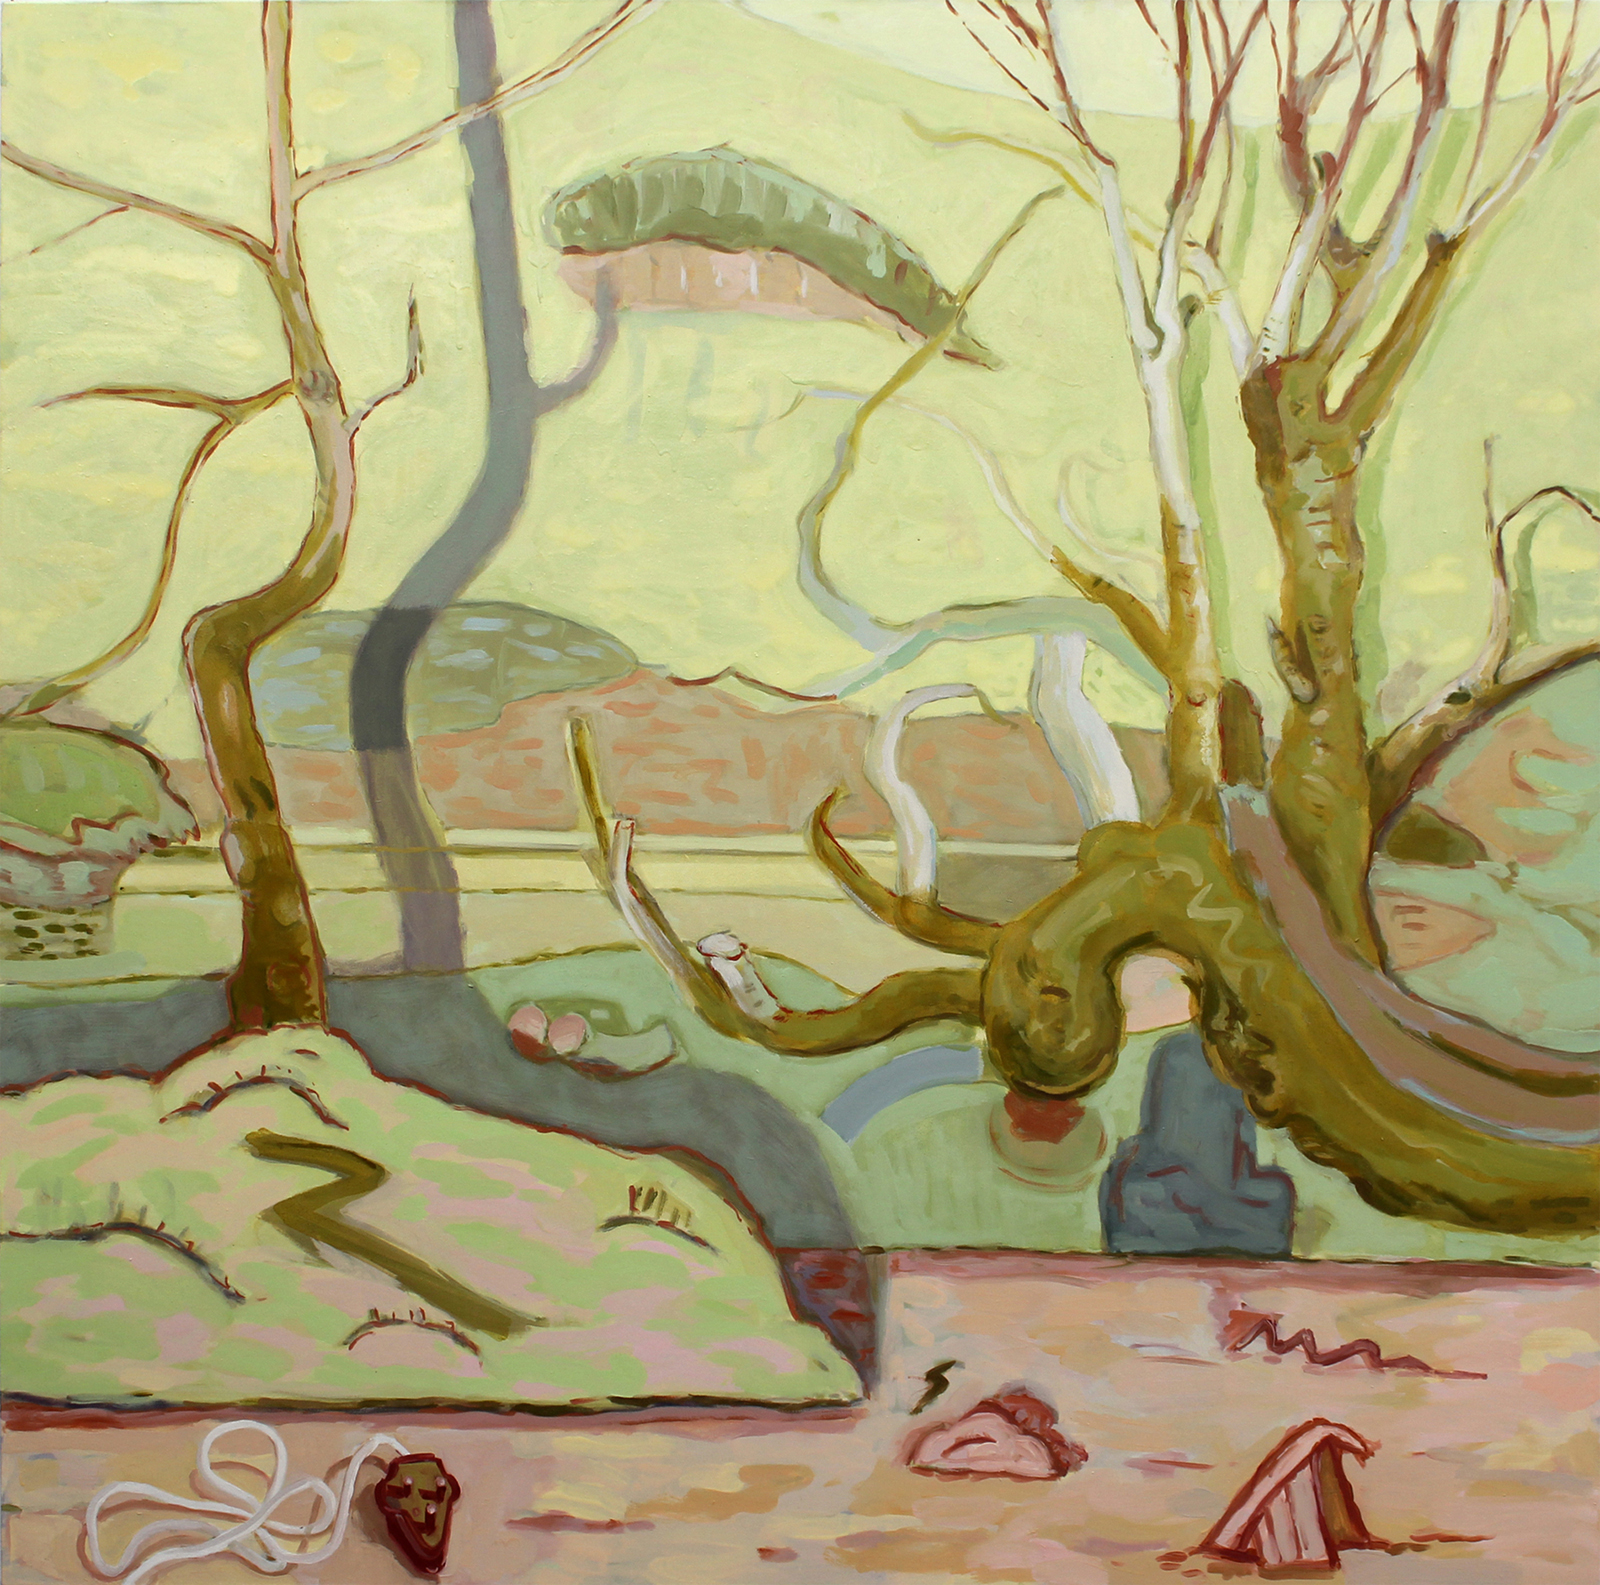 Glade. Angelina Davis. Jackson's Painting Prize.